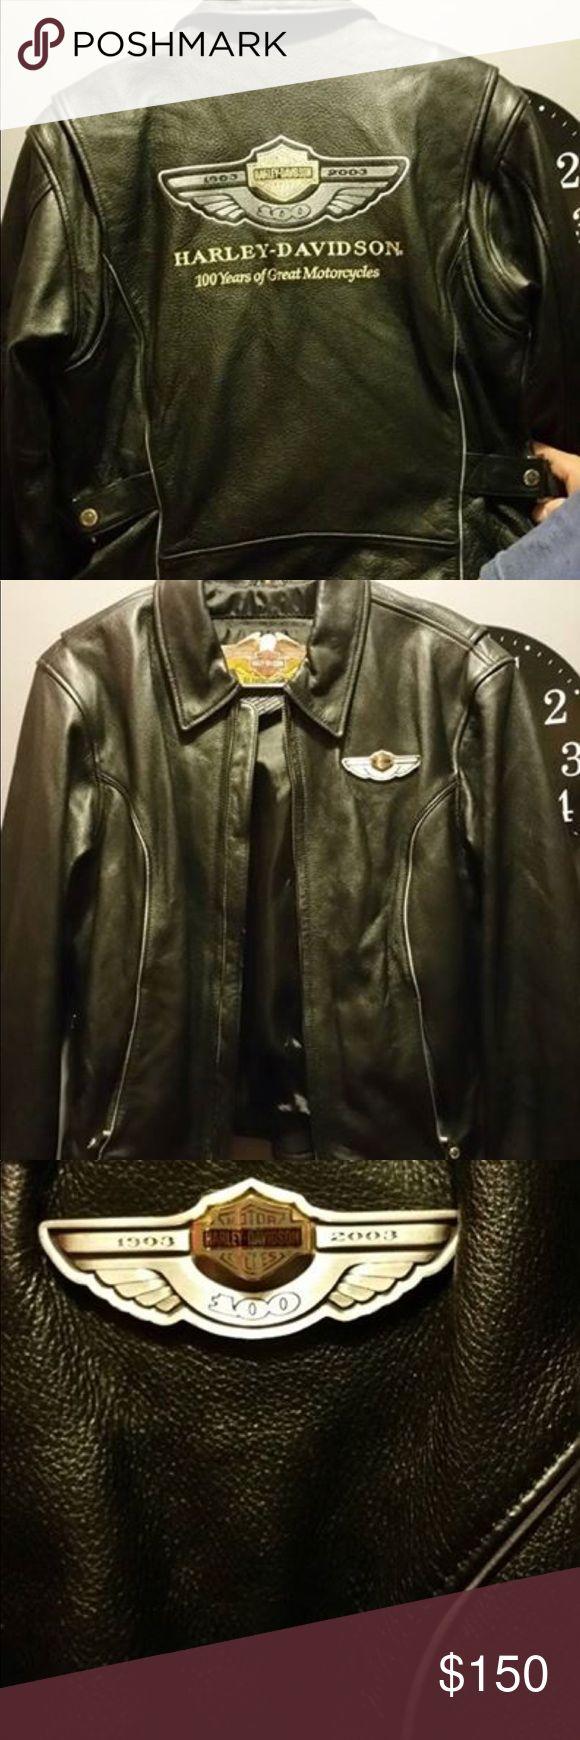 100tg anniversary Harley Davidson leather jacket Size medium women's Harley-Davidson Jackets & Coats